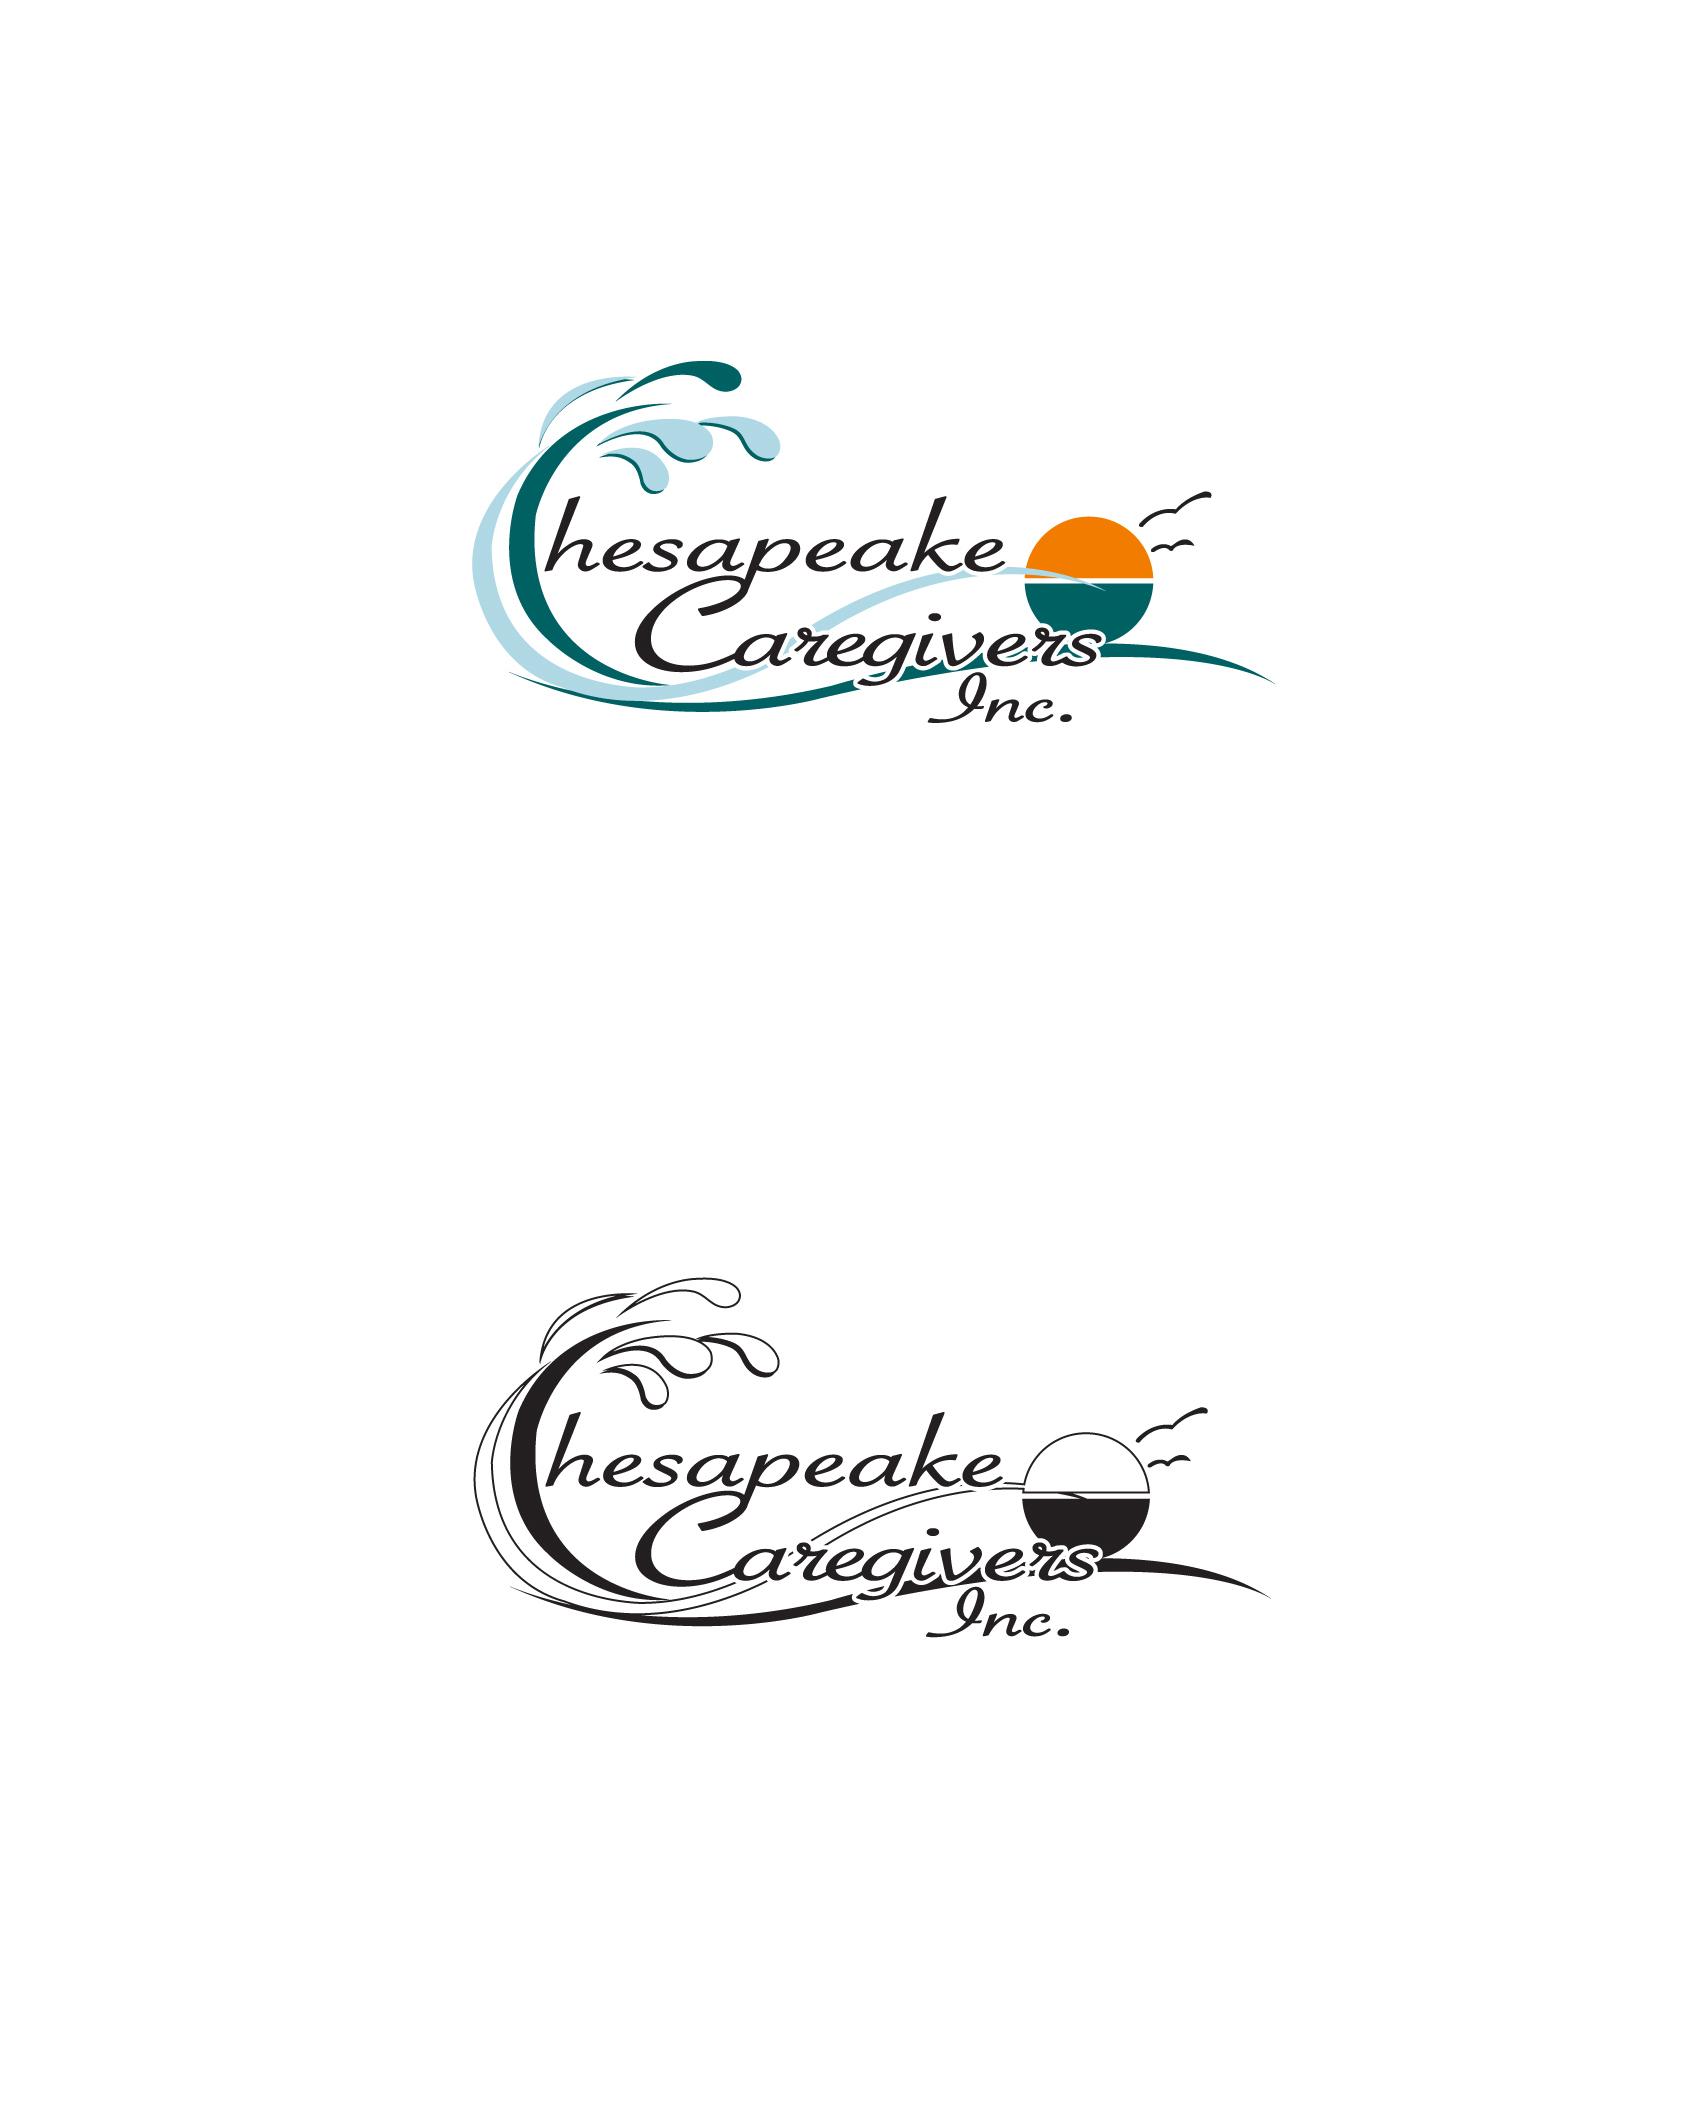 Chesapeake Caregivers, Inc. logo 3